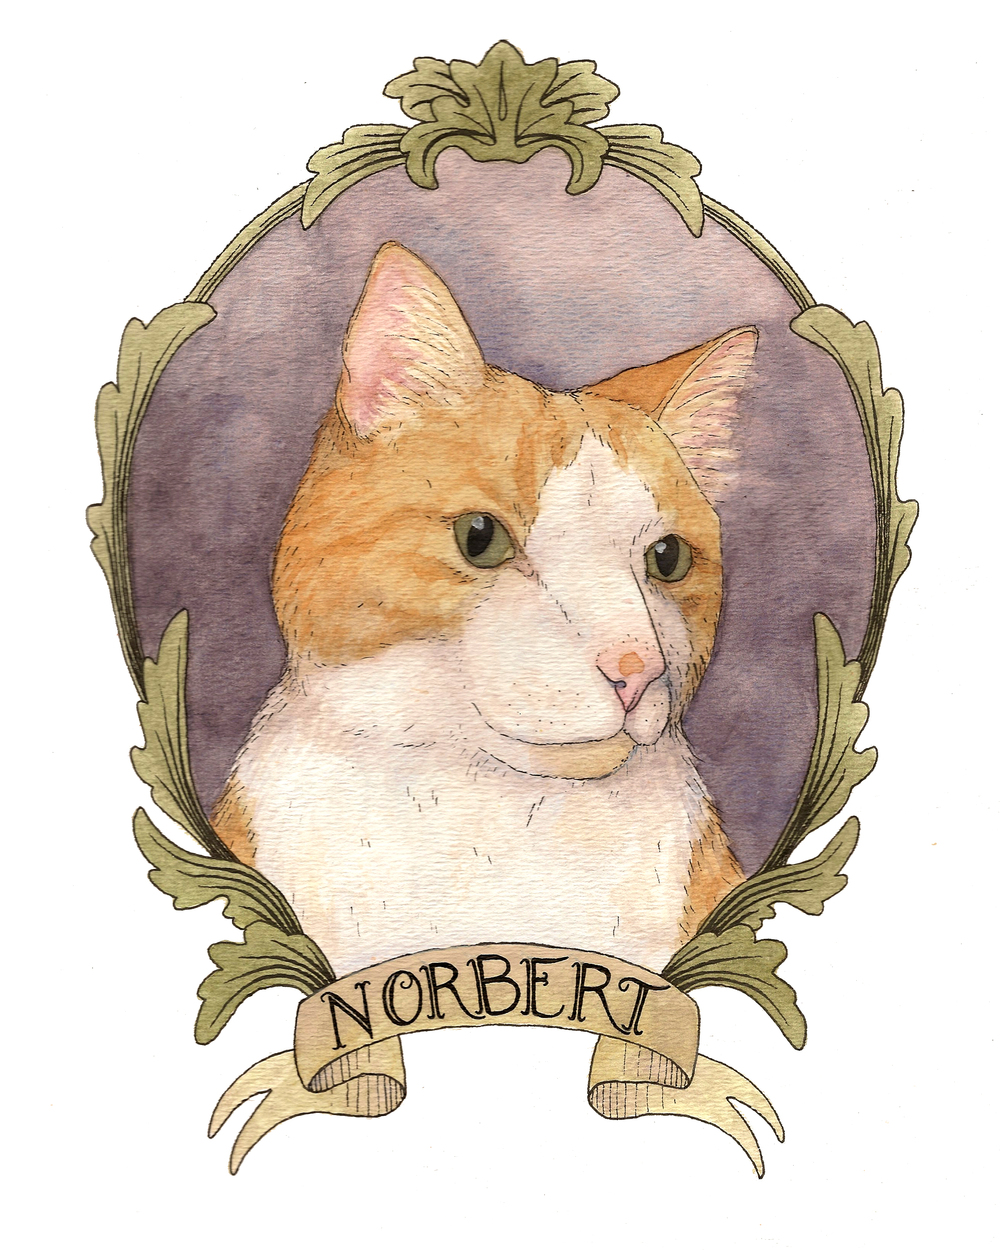 norbert.jpg